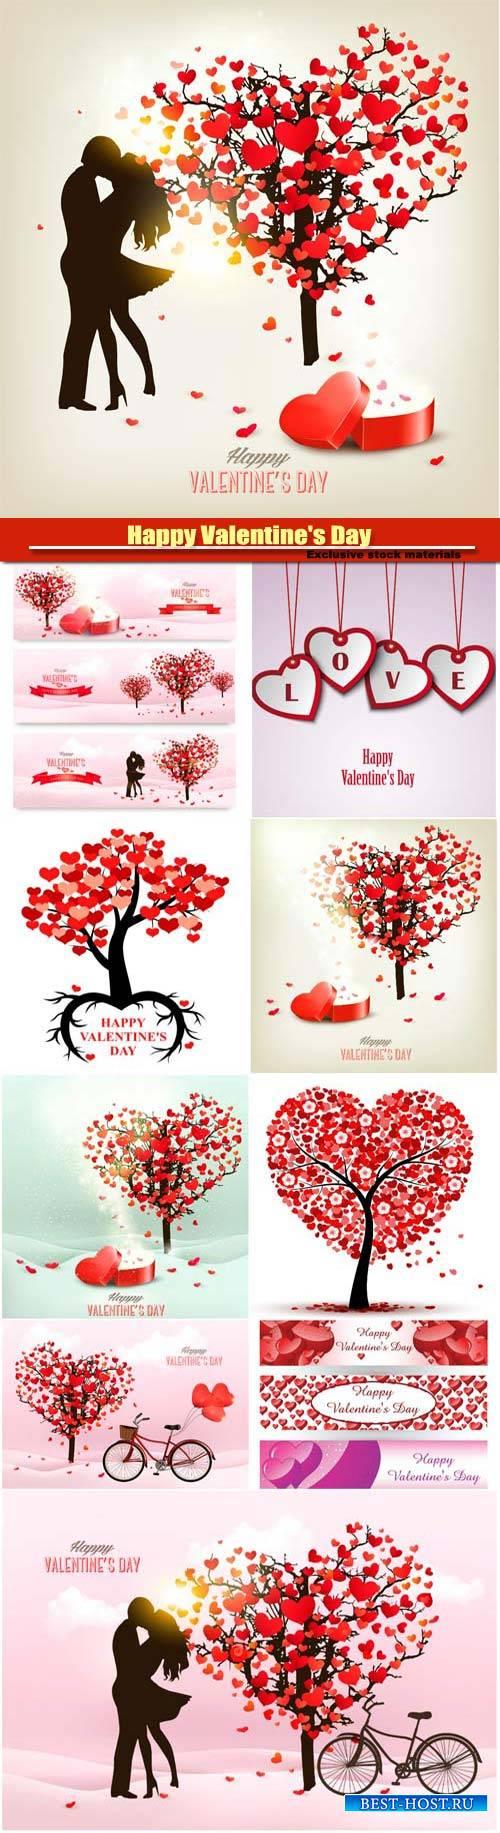 Happy Valentine's Day vector, hearts, romance, love #13